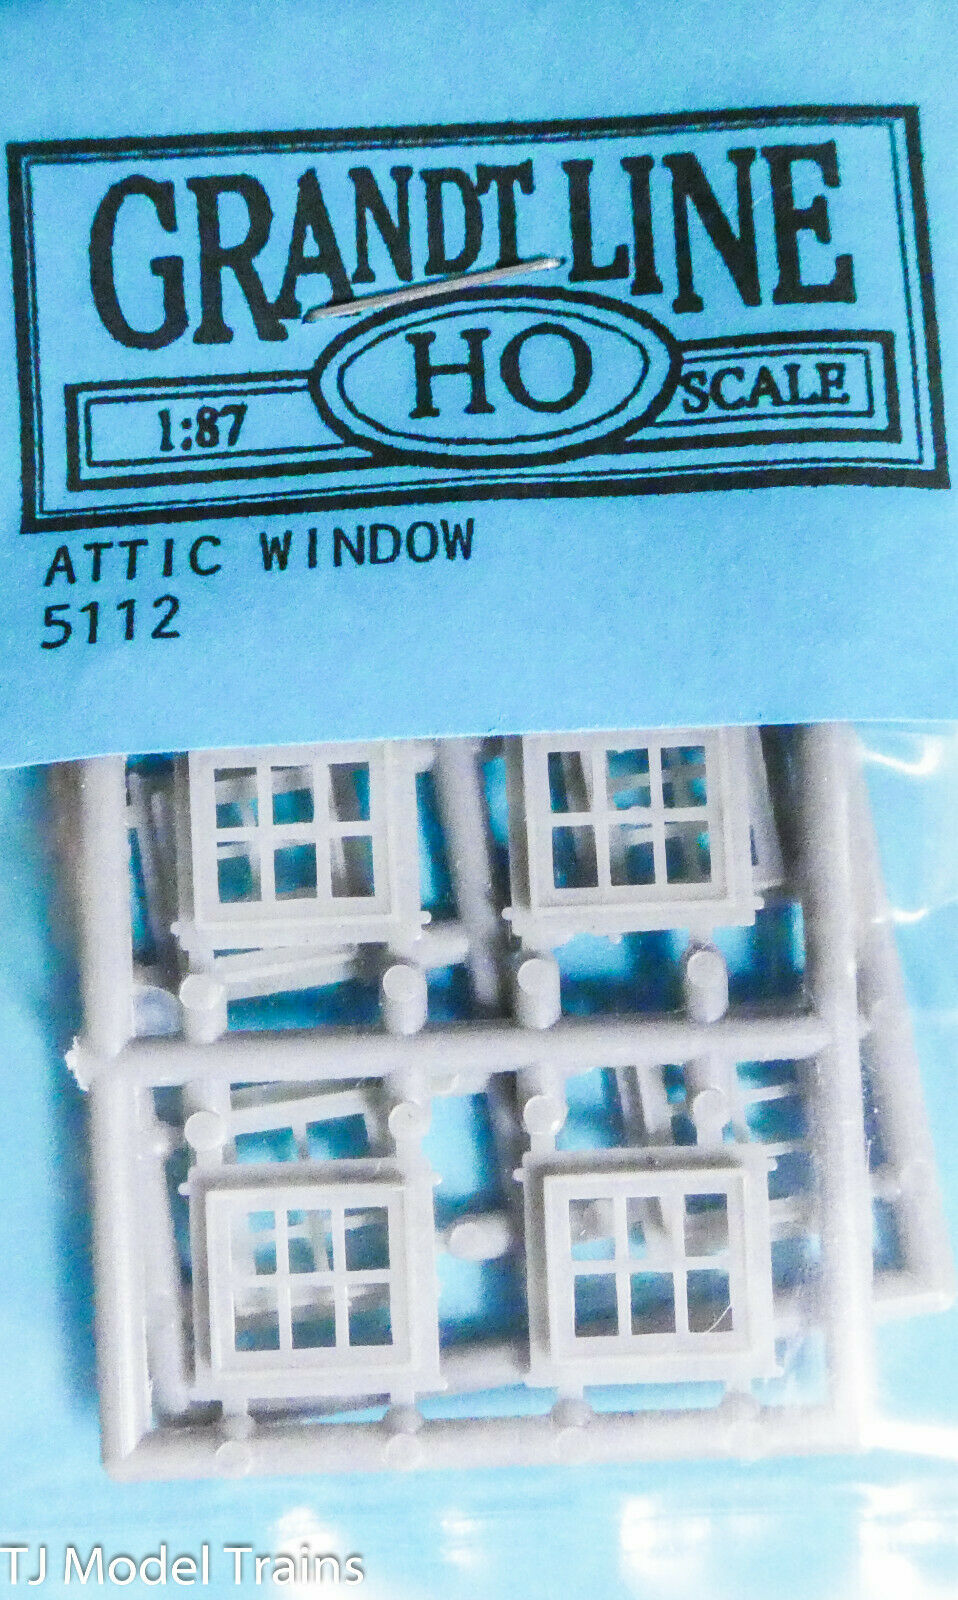 Grandt Line S Scale 12 Pane Window 4028 Plastic Parts